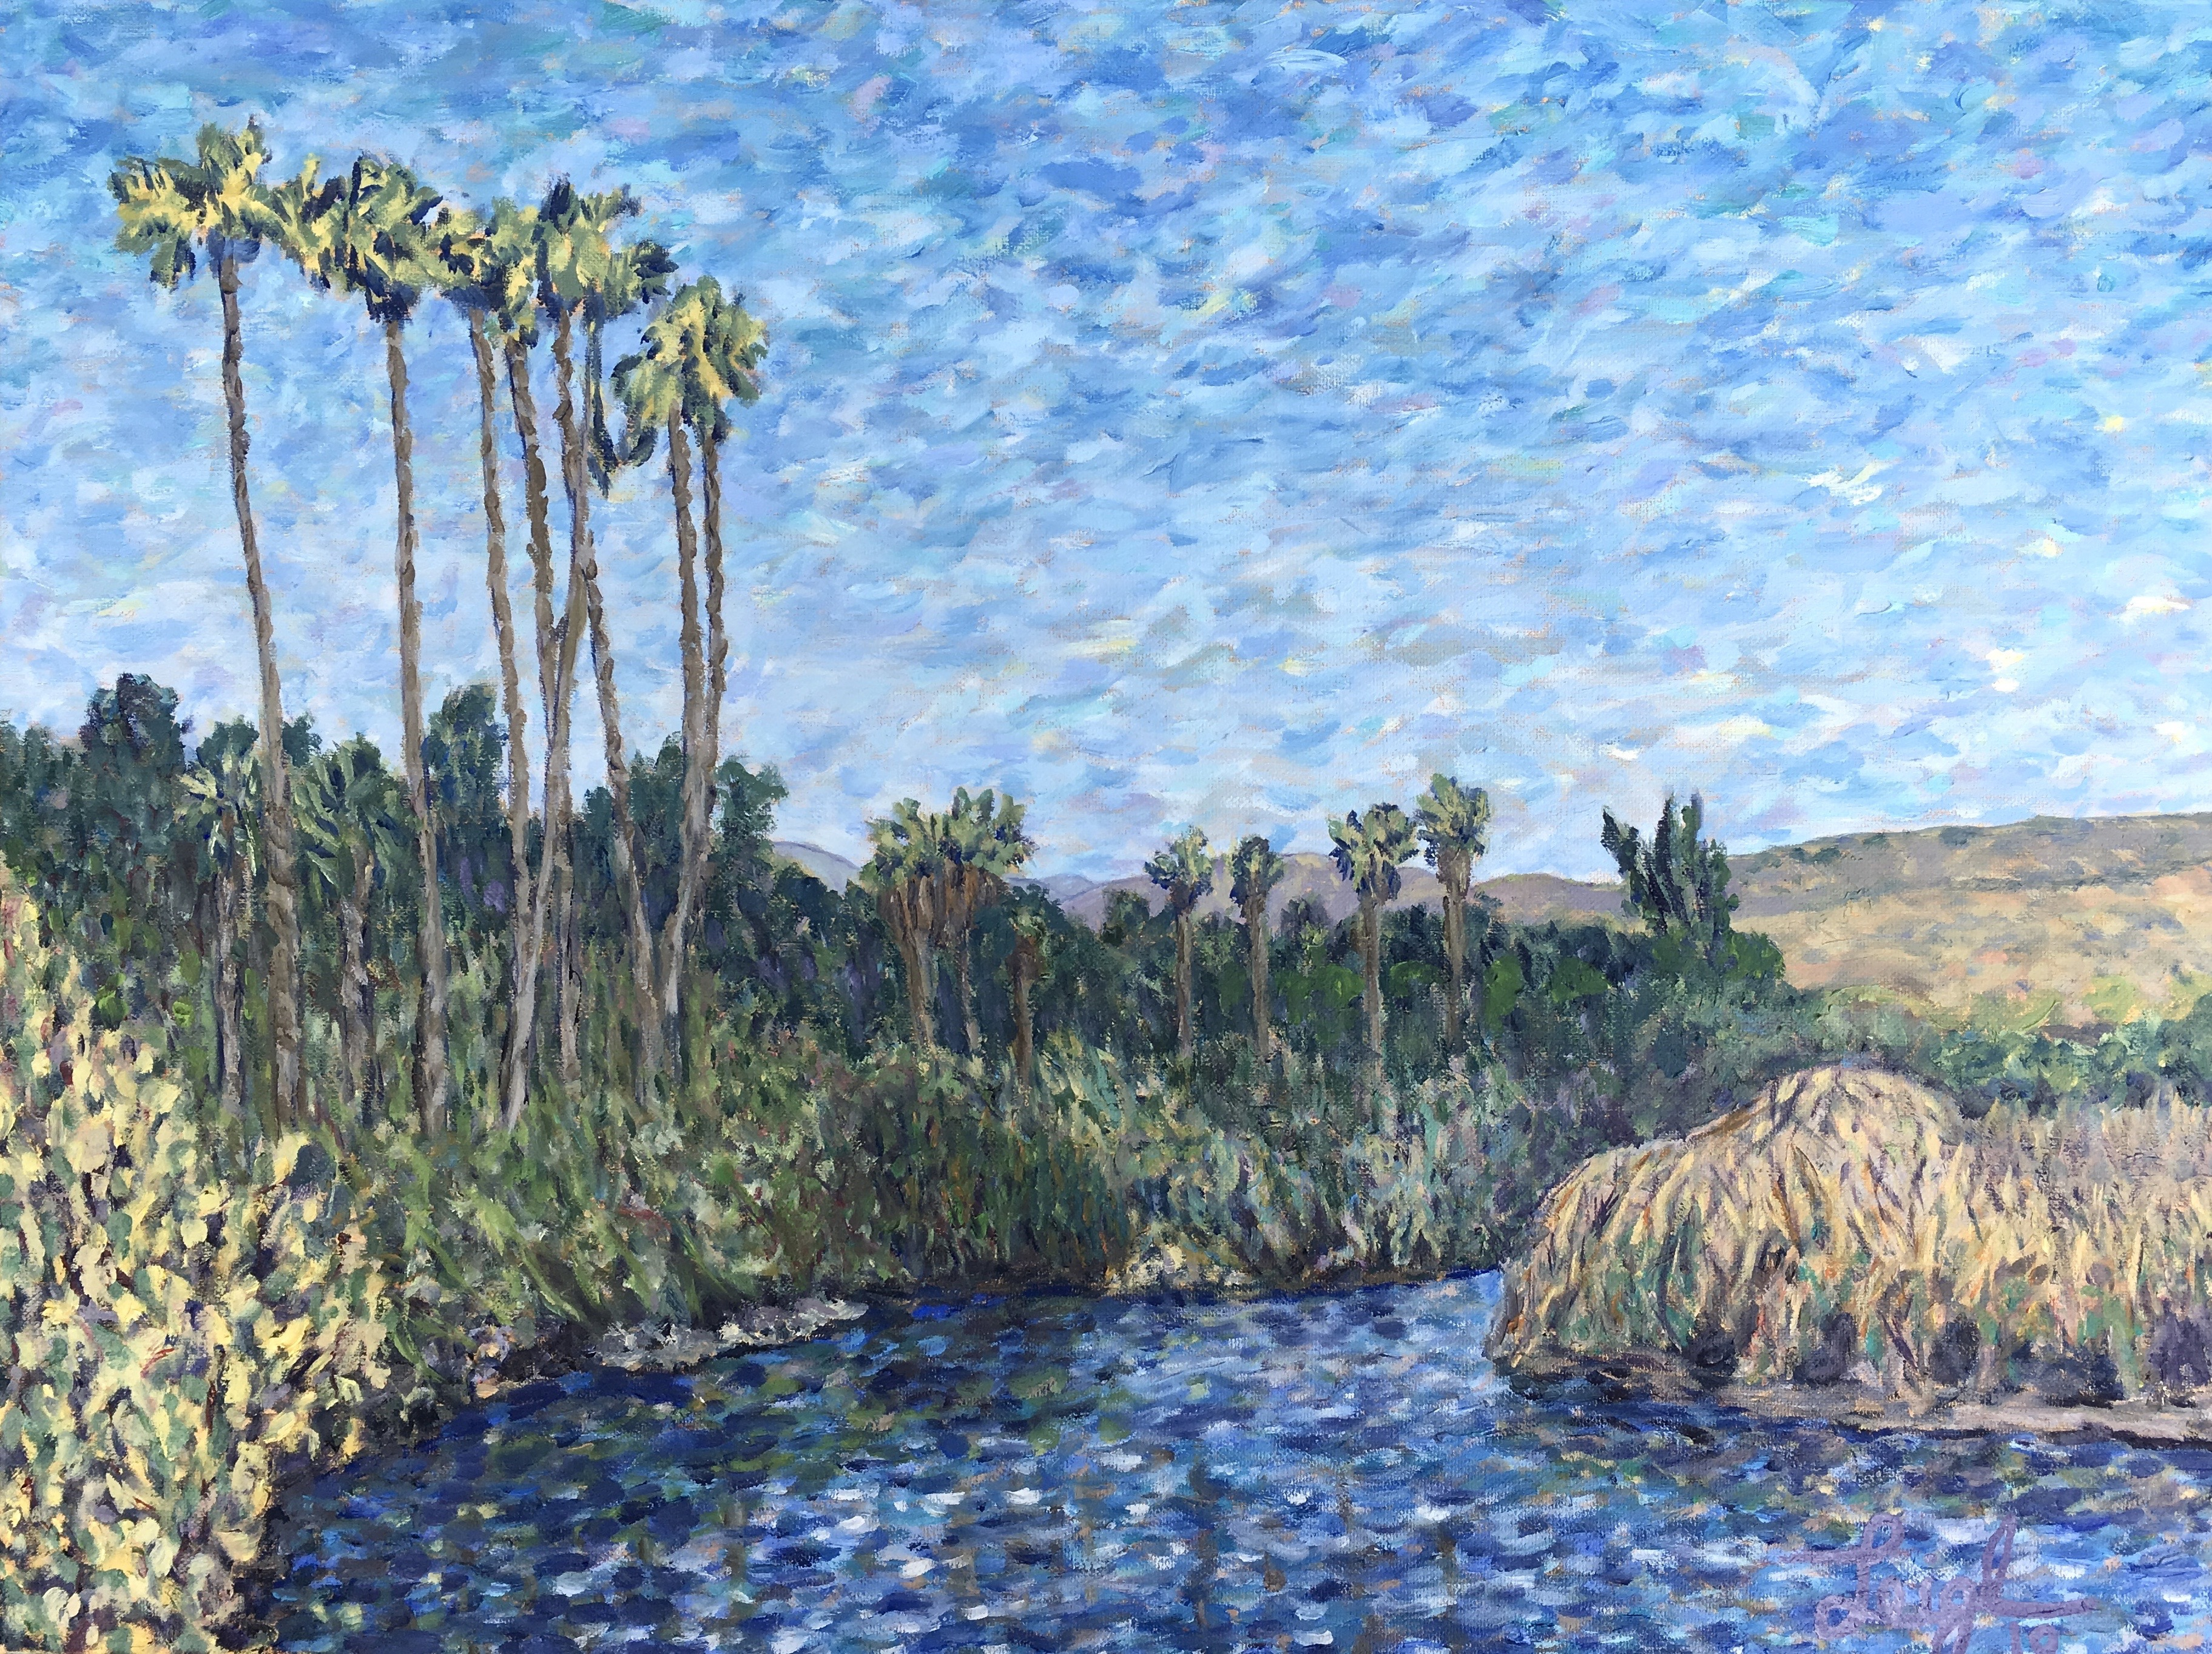 Hendry's Arroyo Burro, Santa Barbara  ~  Chris & Shery Walker, Santa Clarita, CA  2019  •  24 x 18